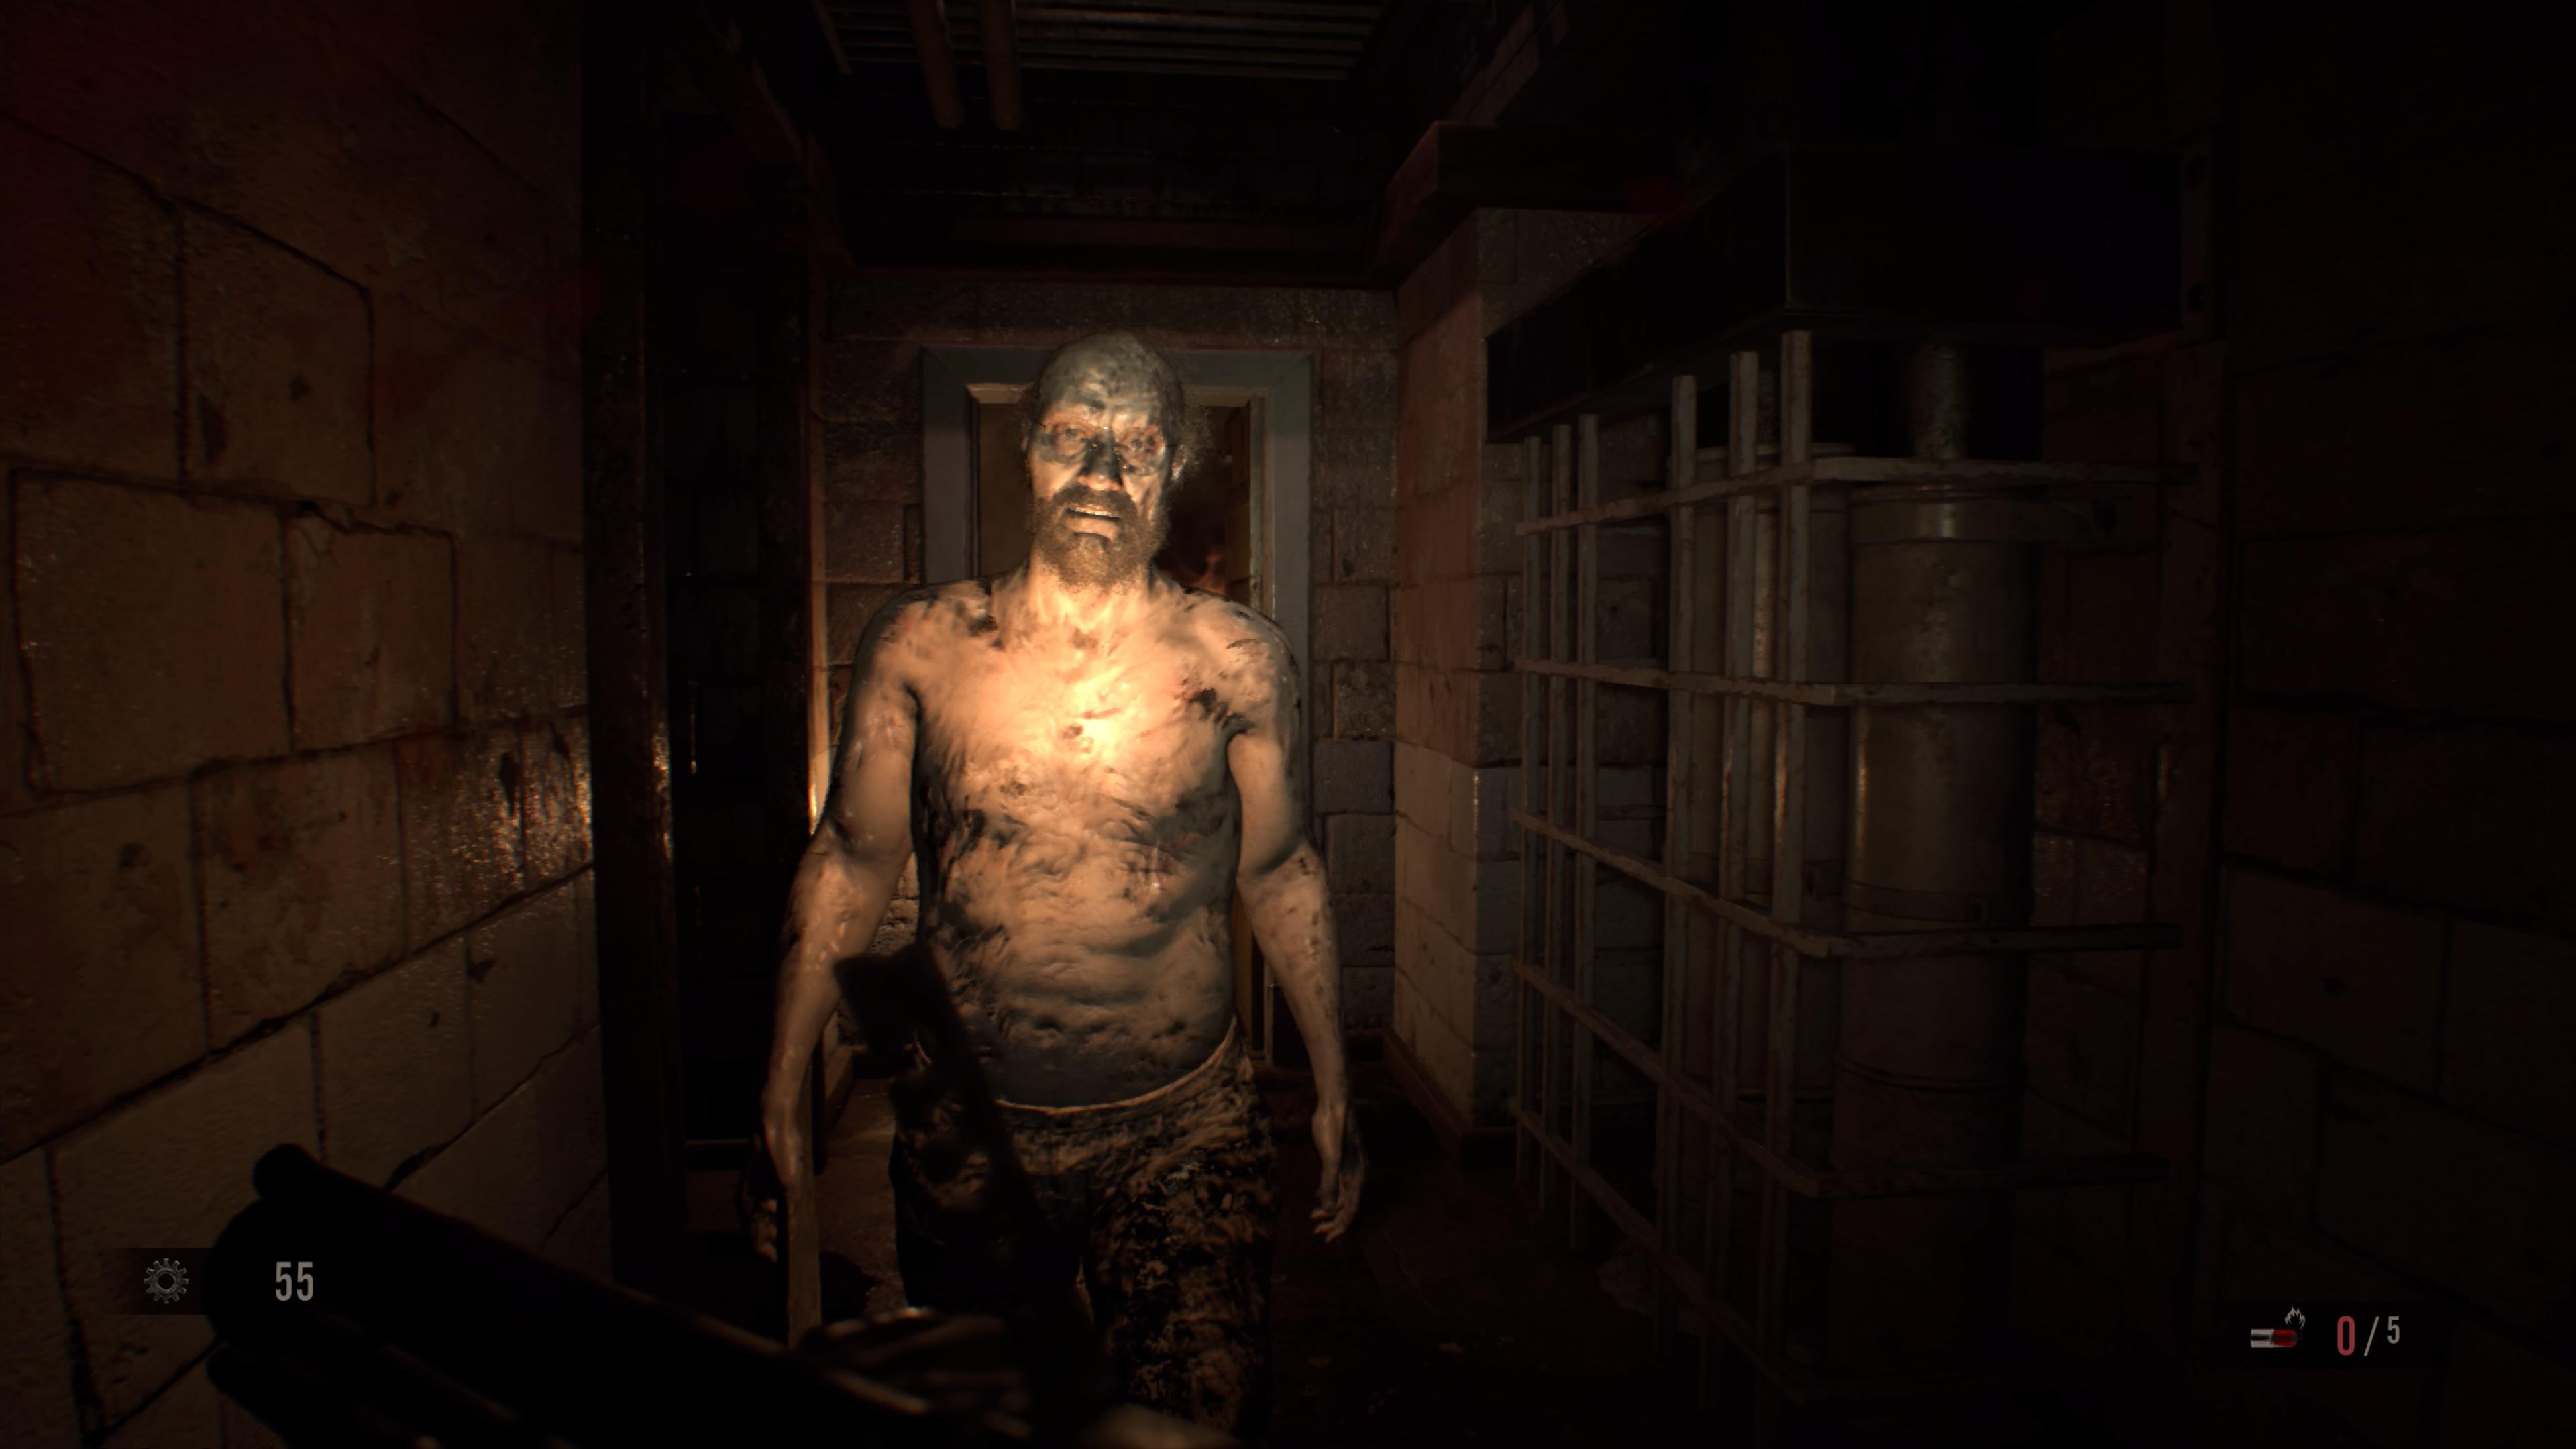 Resident Evil 7 speedrun is a knife-only Madhouse sprint